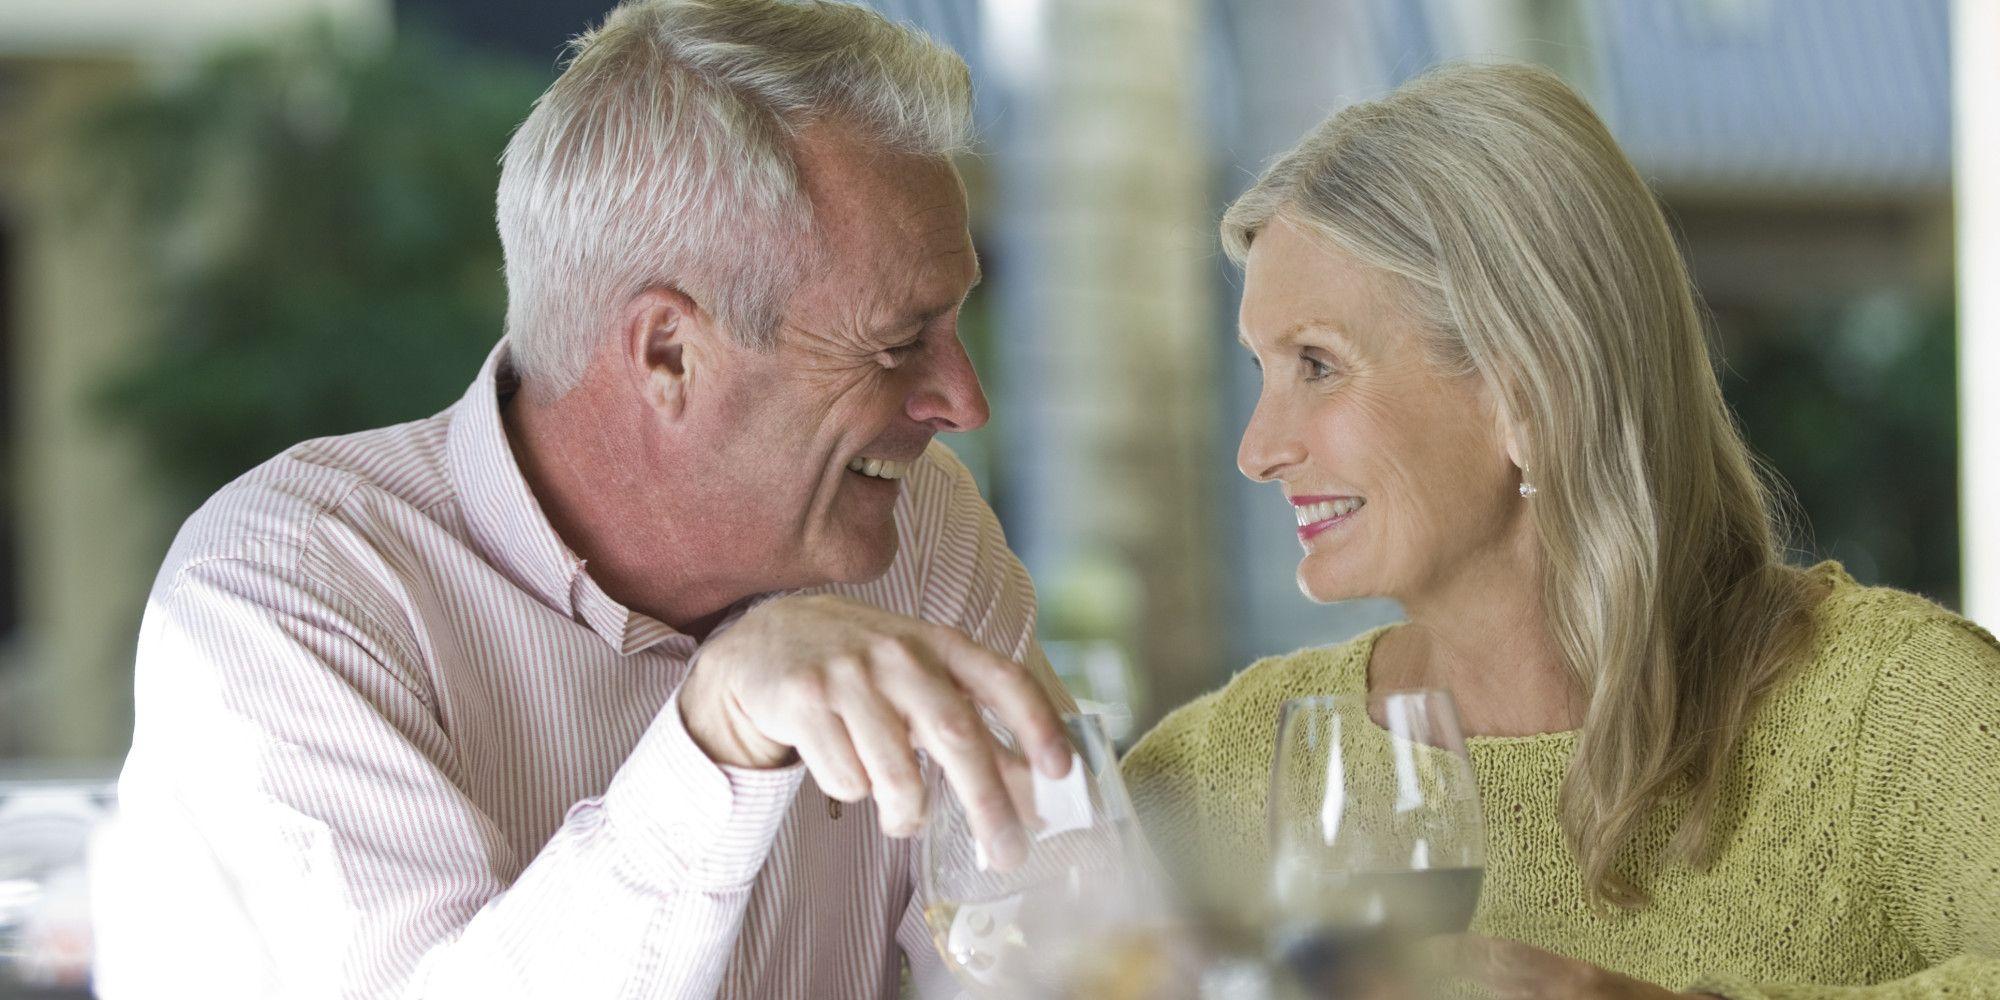 Agencies dating for citizens senior photo